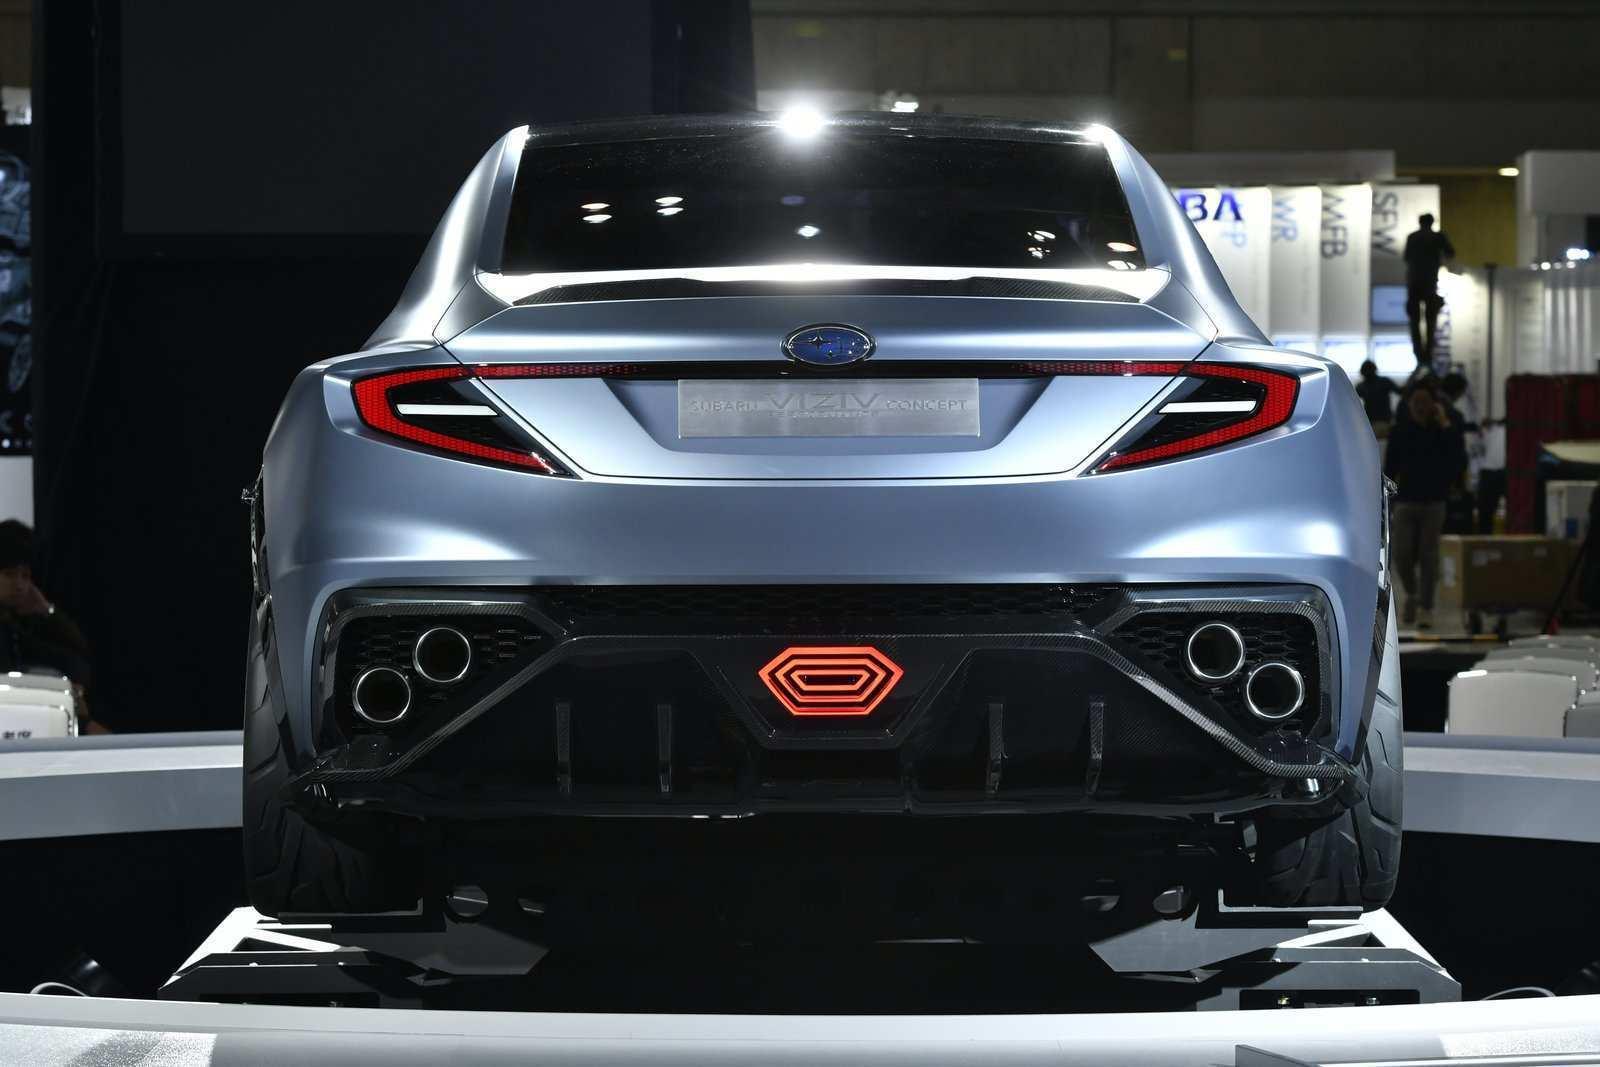 42 New 2020 Subaru Sti Release Date Concept with 2020 Subaru Sti Release Date